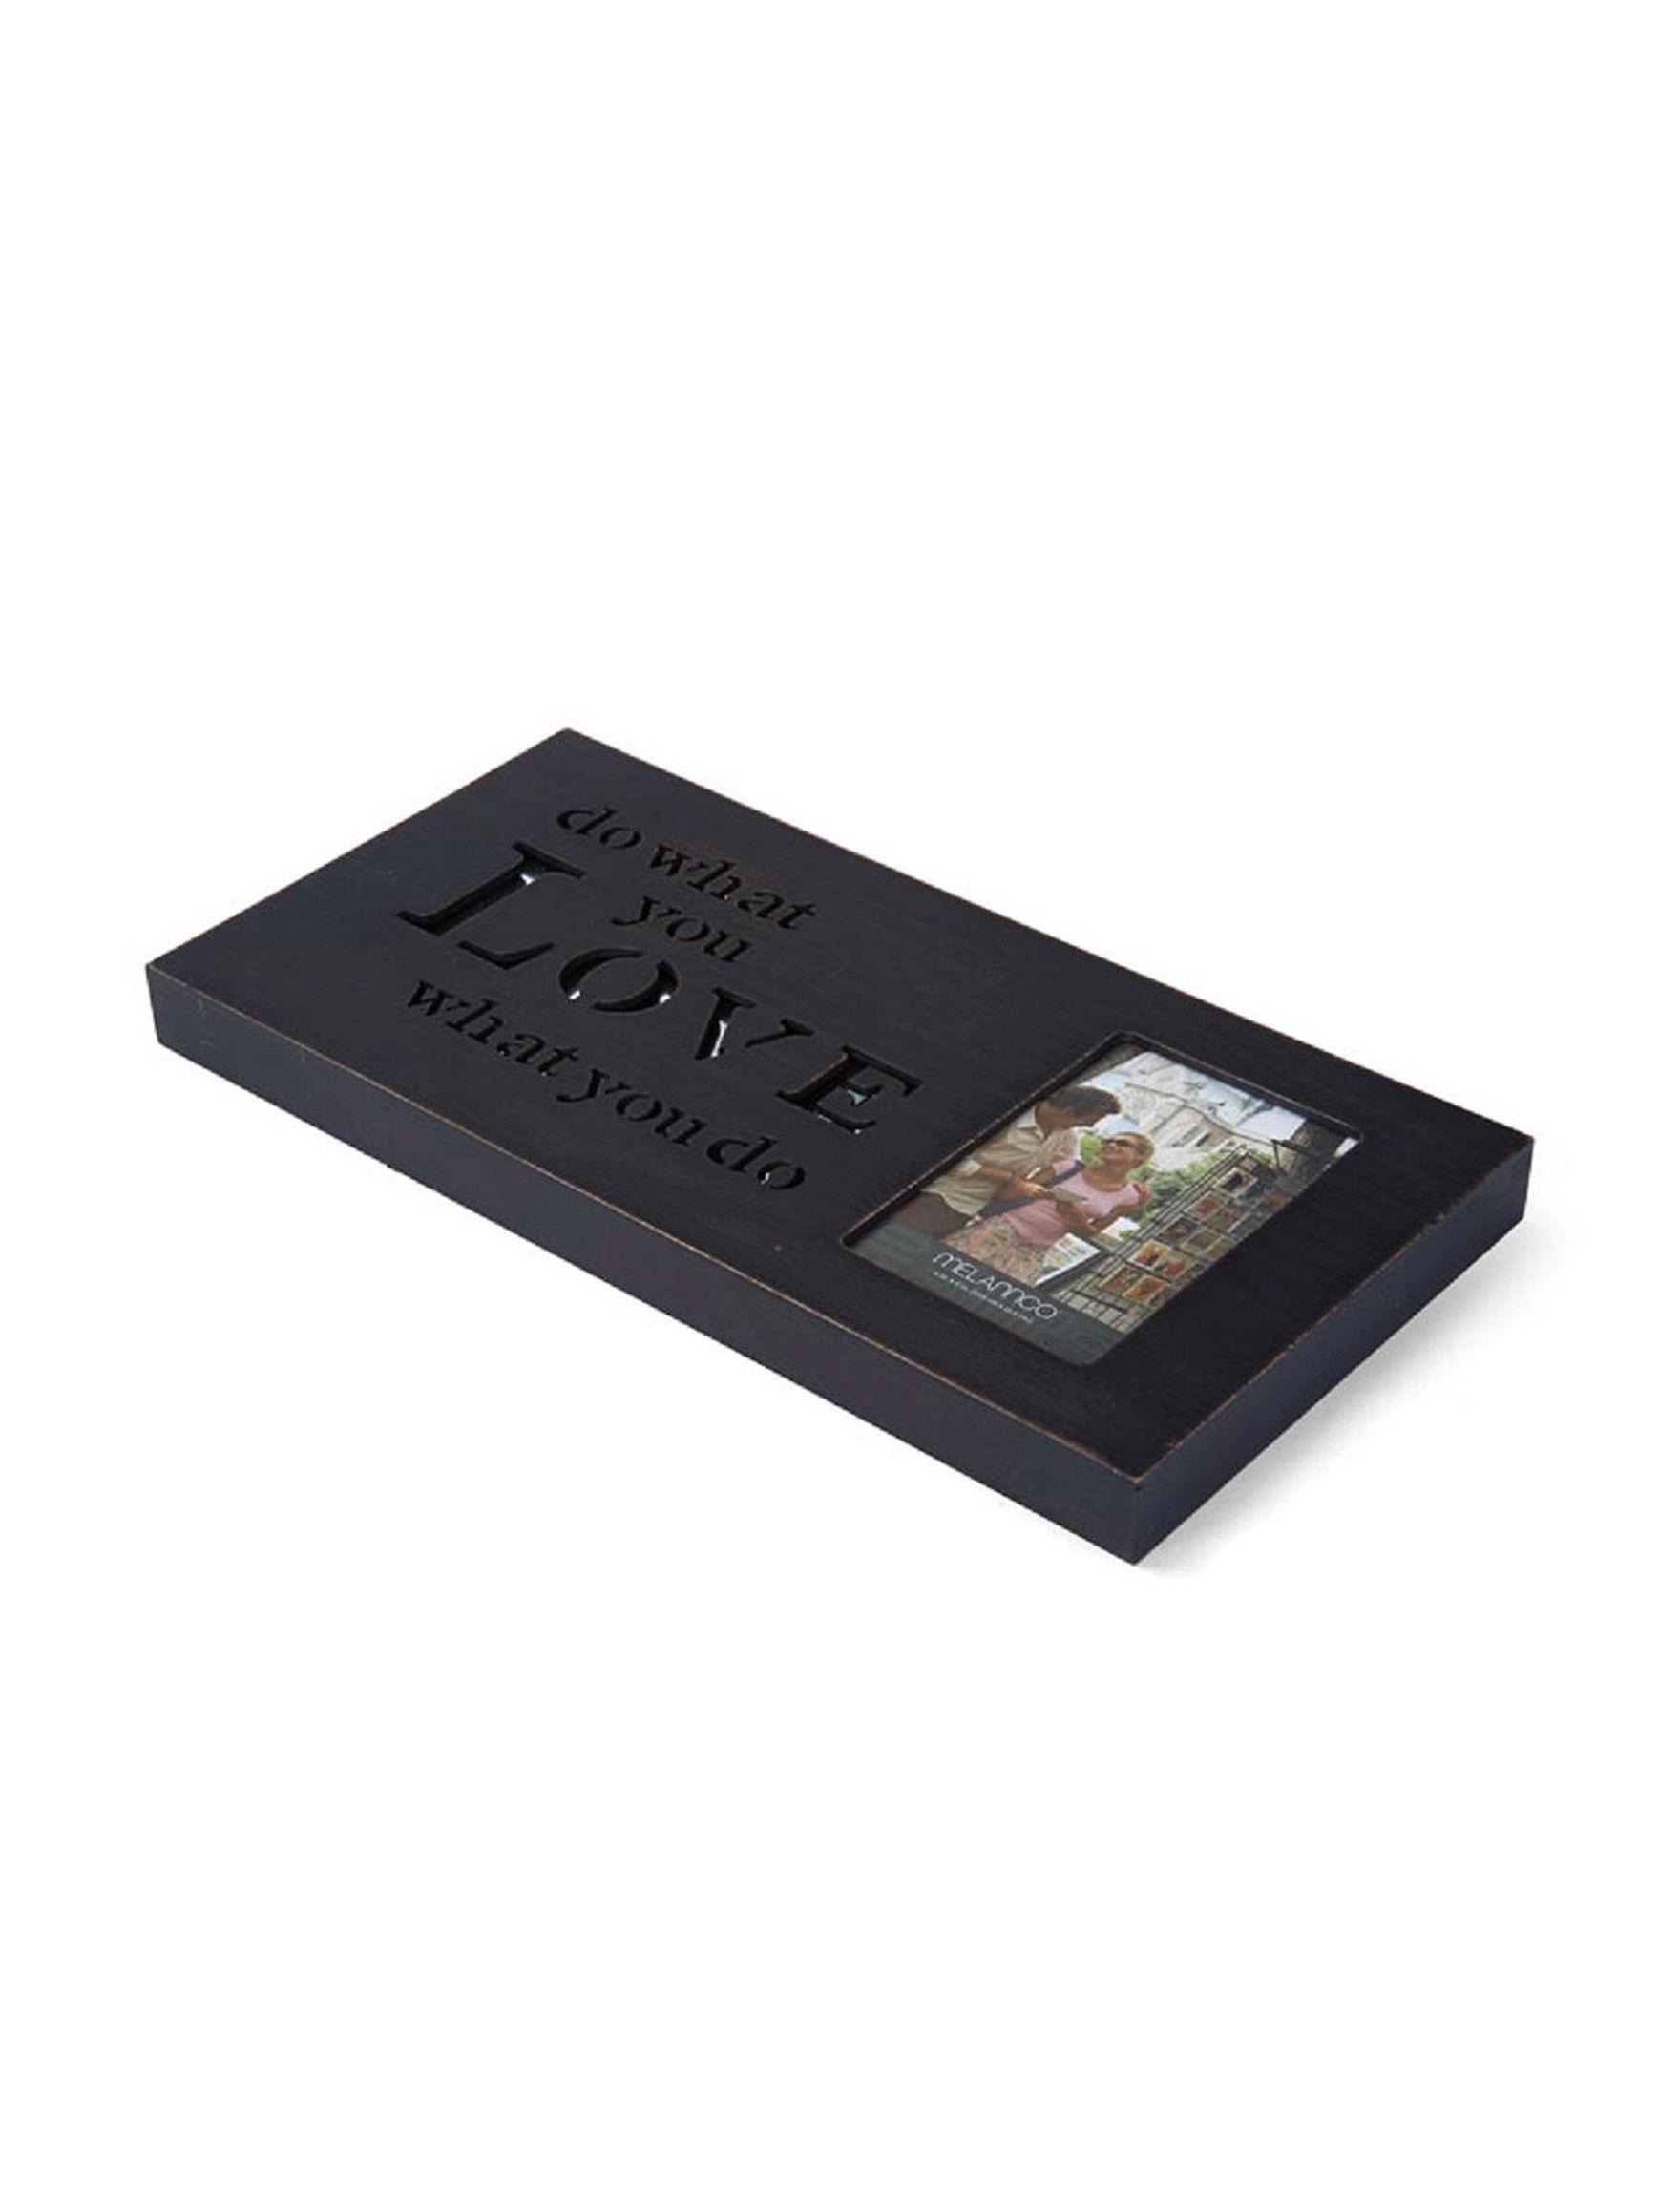 Lifetime Black Frames & Shadow Boxes